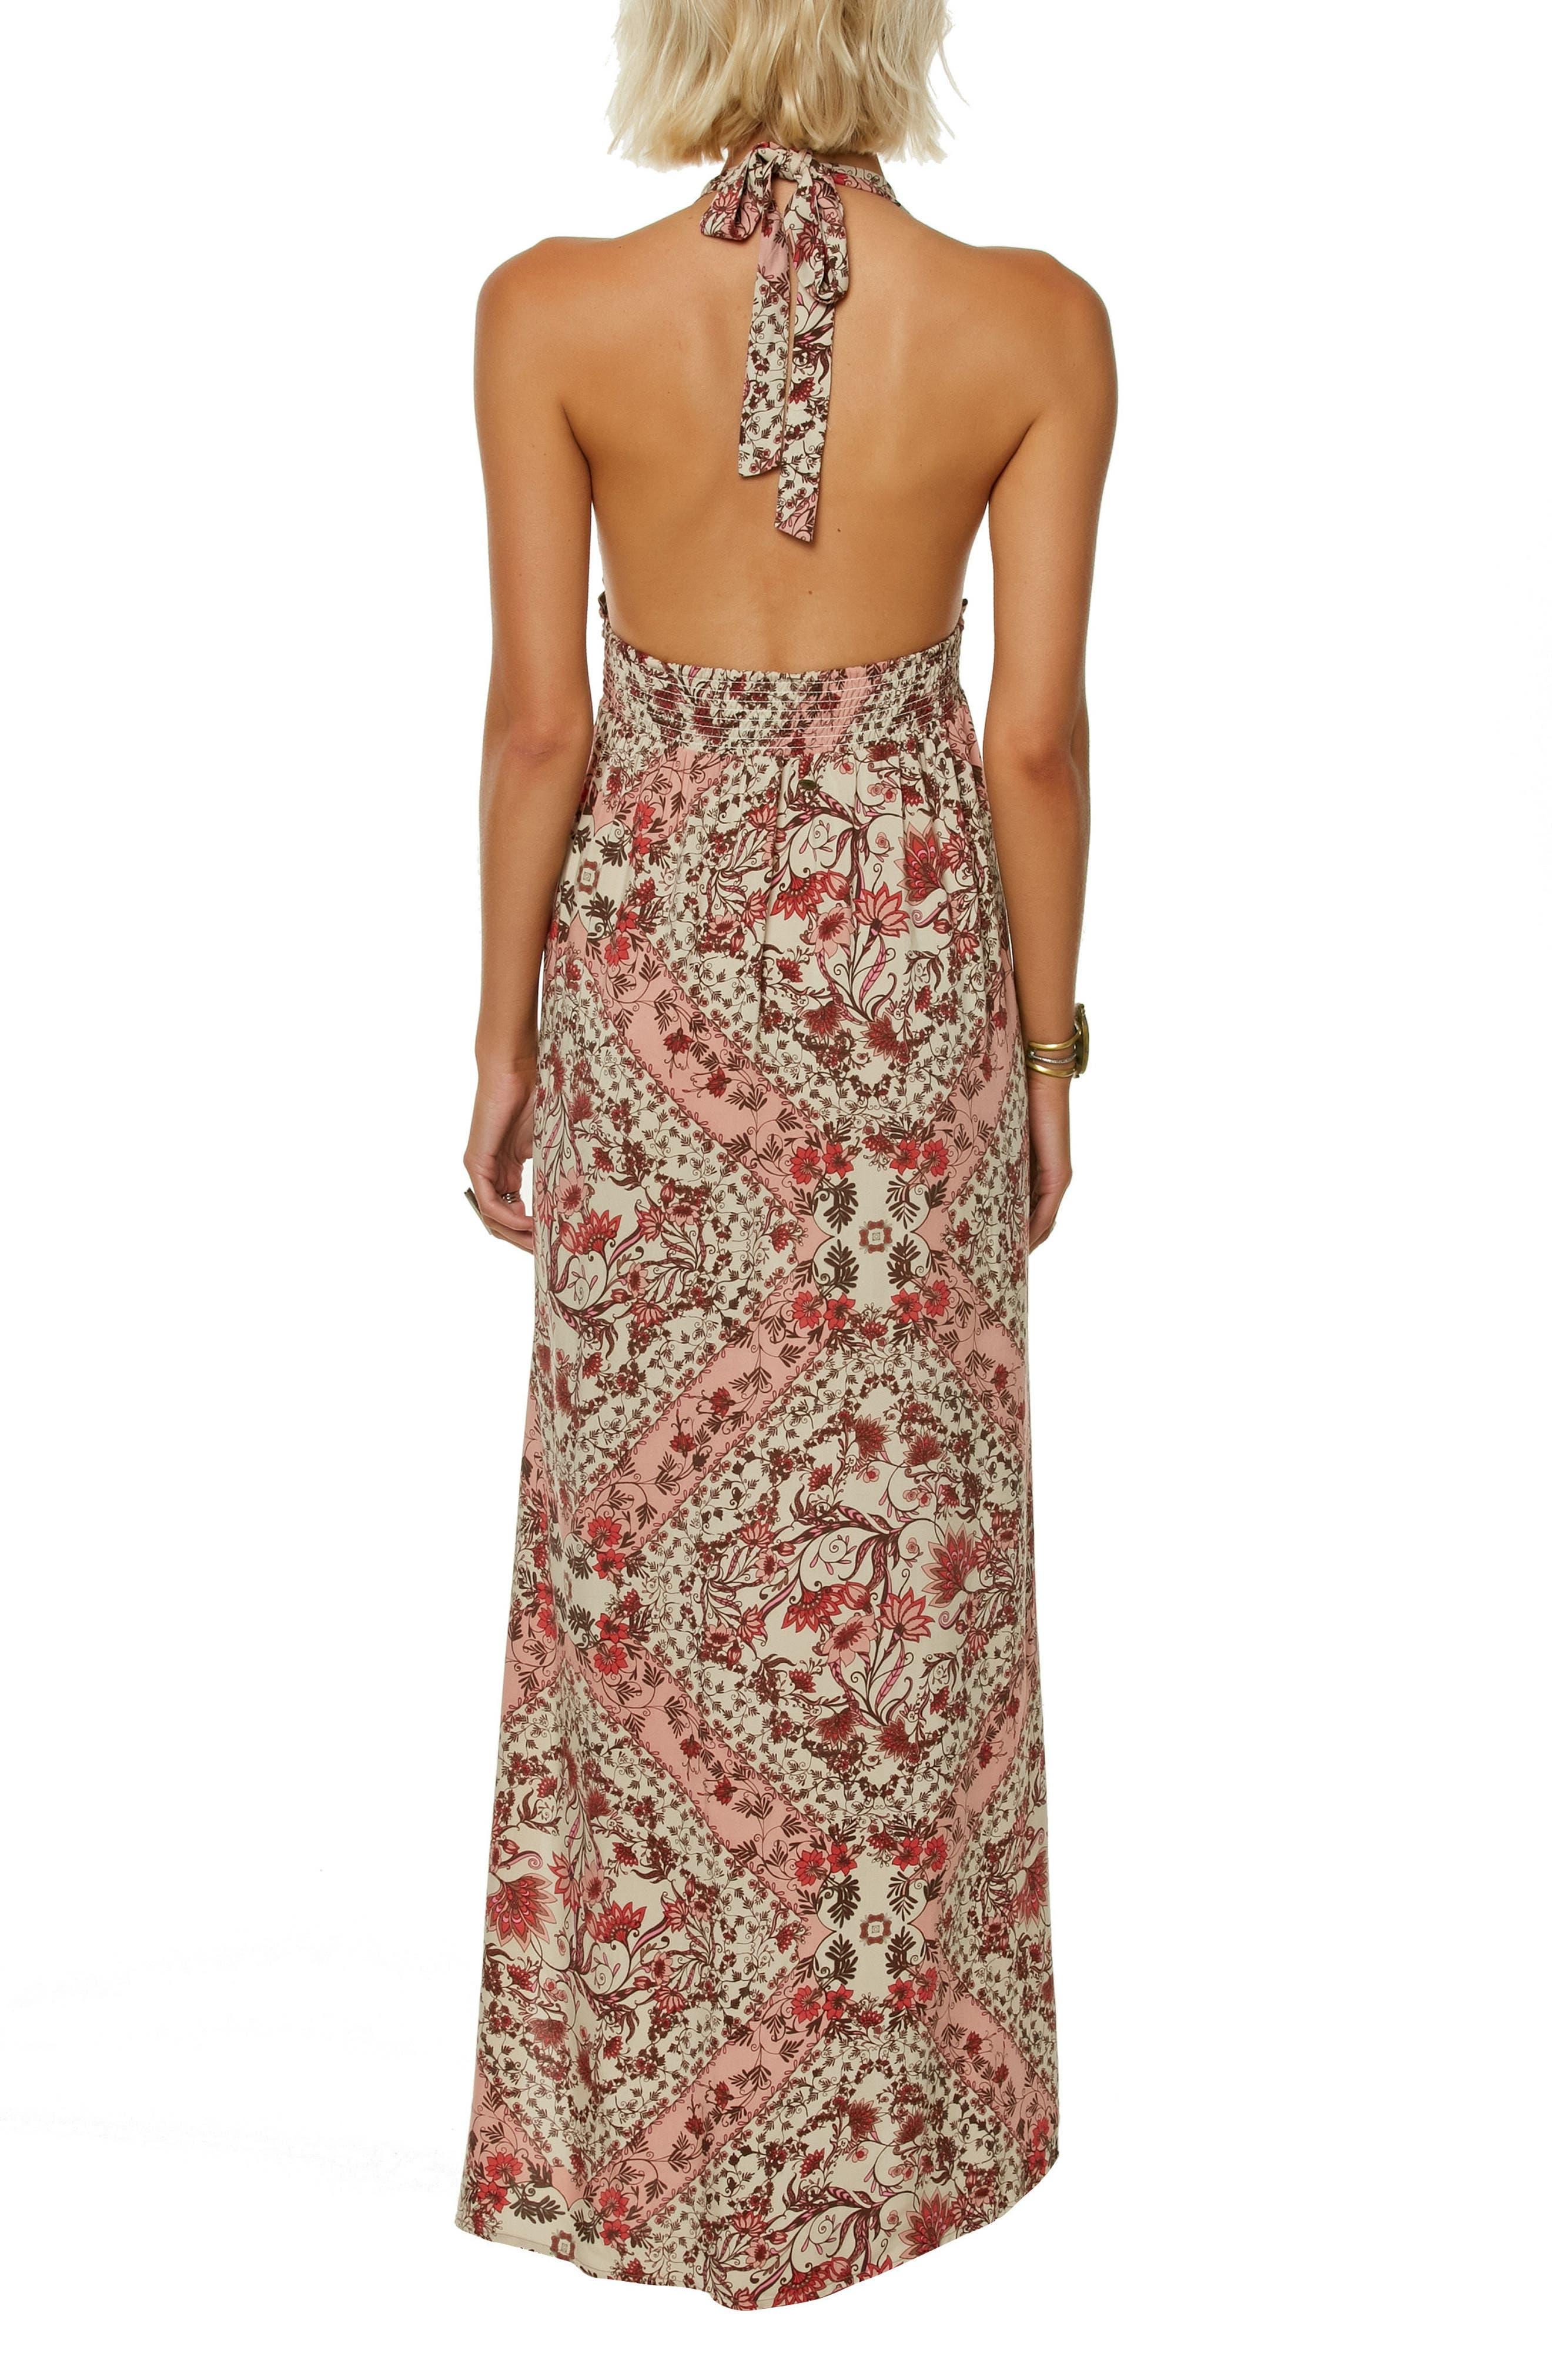 Dolley Halter Neck Maxi Dress,                             Alternate thumbnail 2, color,                             CAF CREME